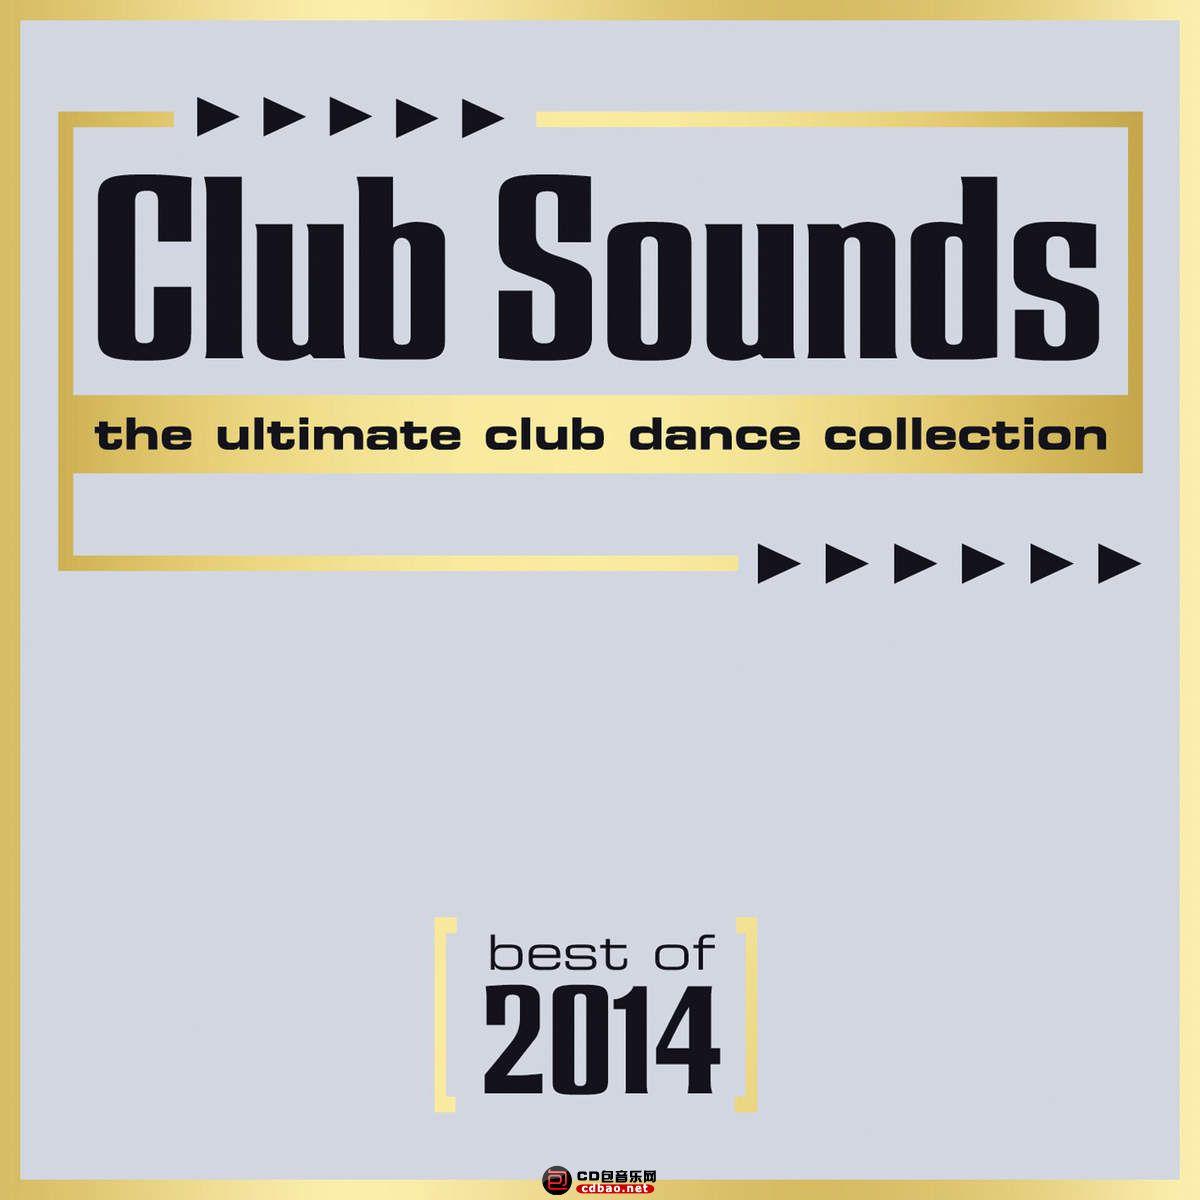 club_sounds-best_of_2014_3cd.jpg